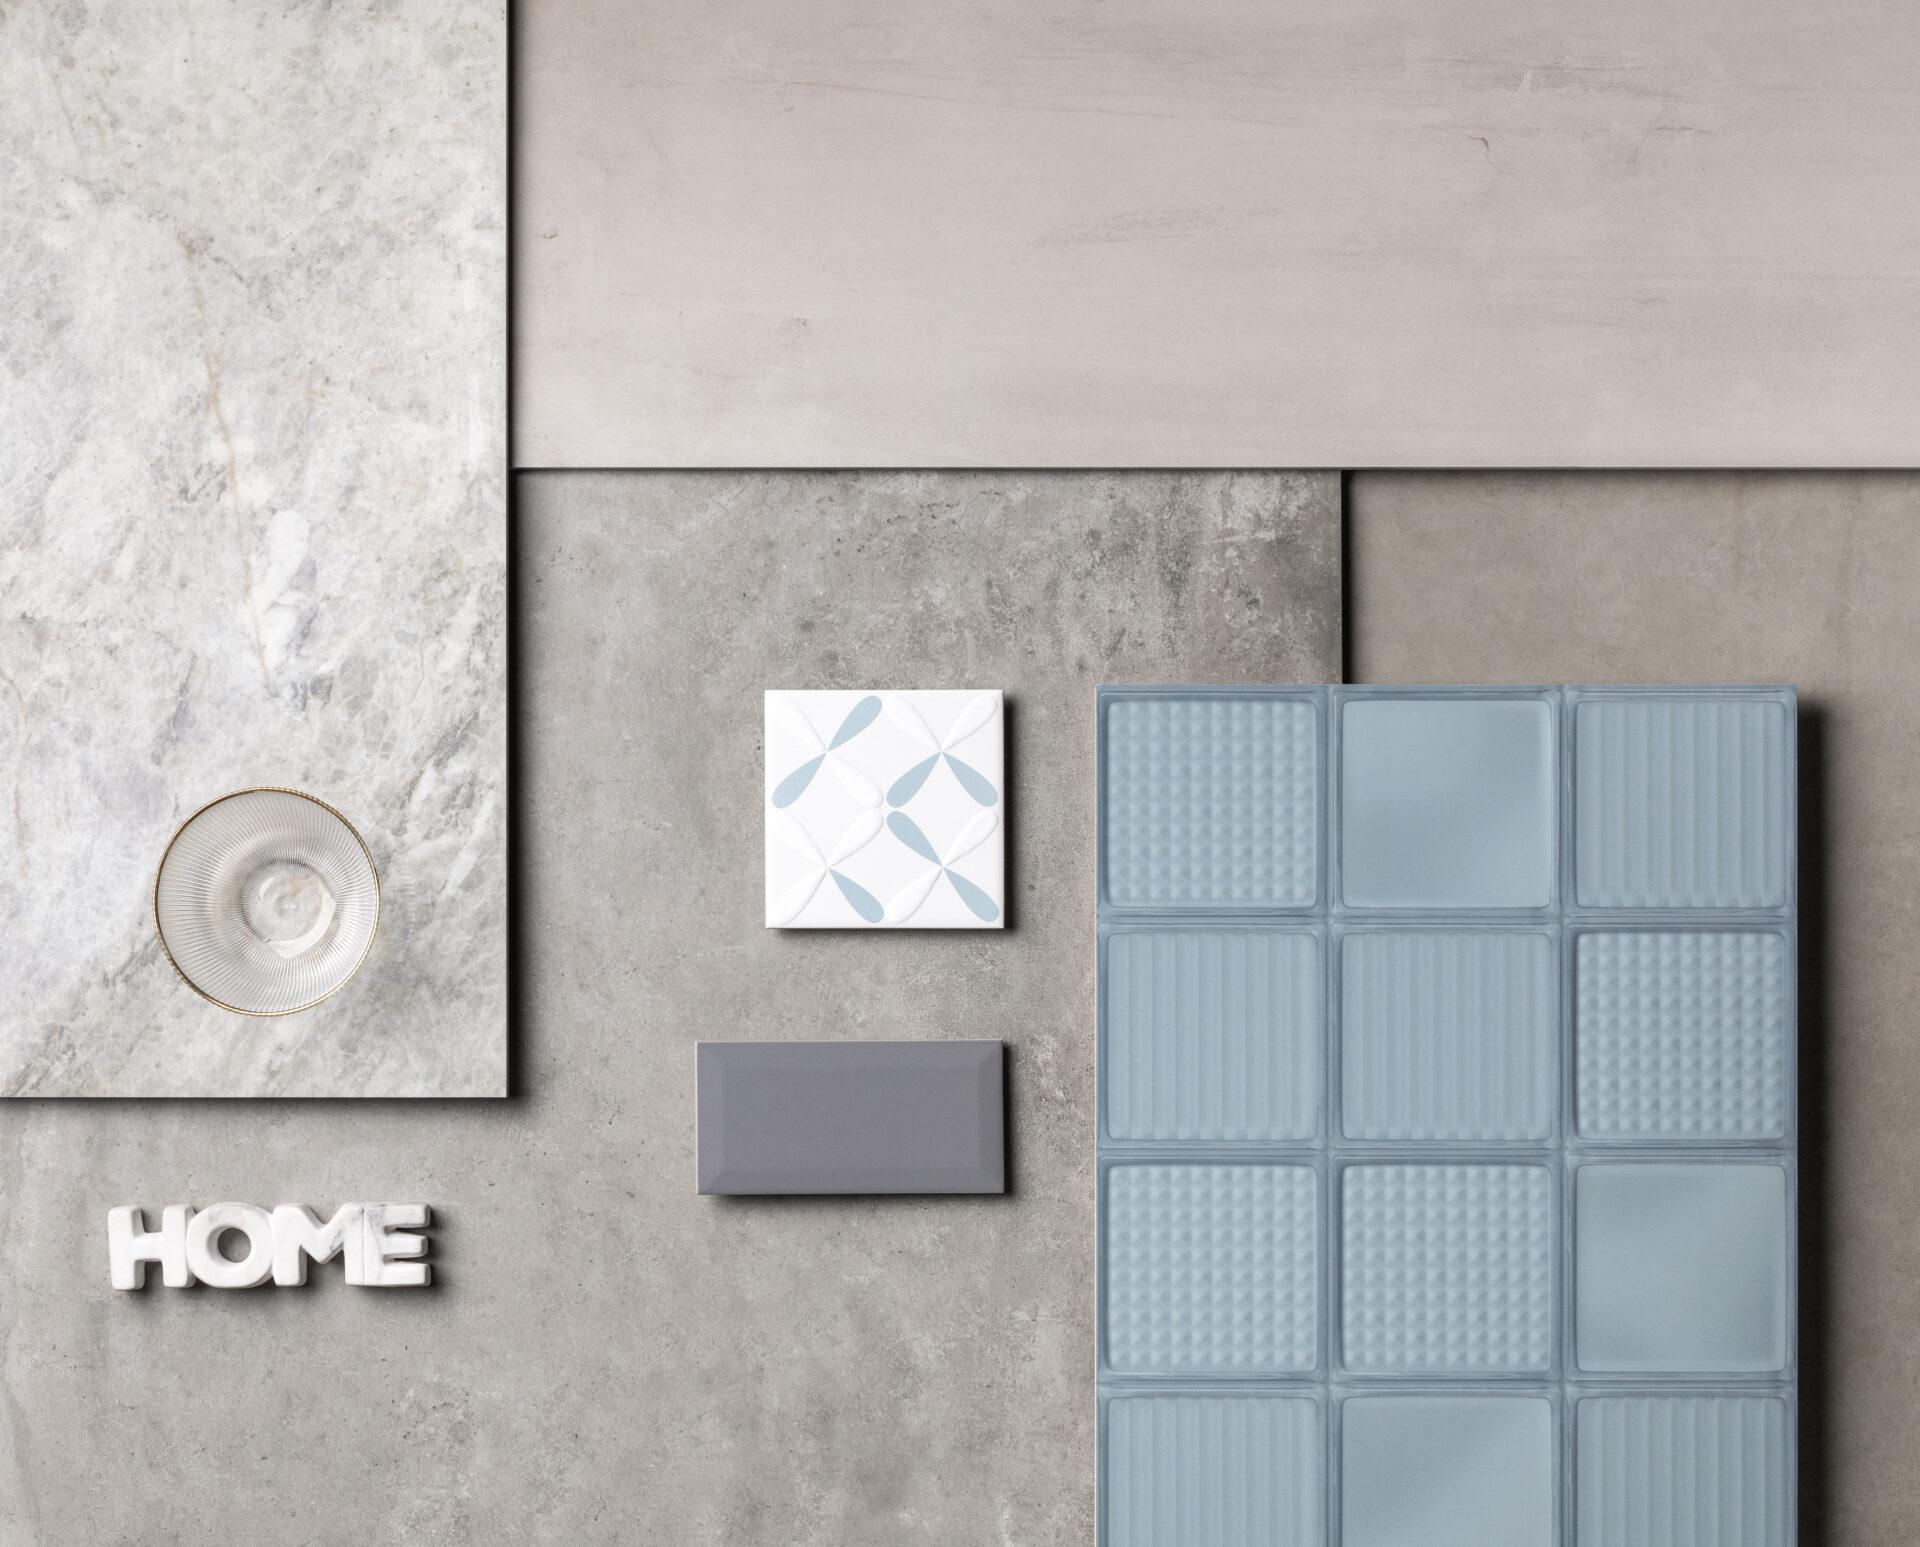 London AC 59×118,2cm | Flat AC 90x90cm | Metro Grey 10x20cm | Calf PO 90x90cm | Alfa Azul AC 15x15cm | Glass Blue 45x90cm